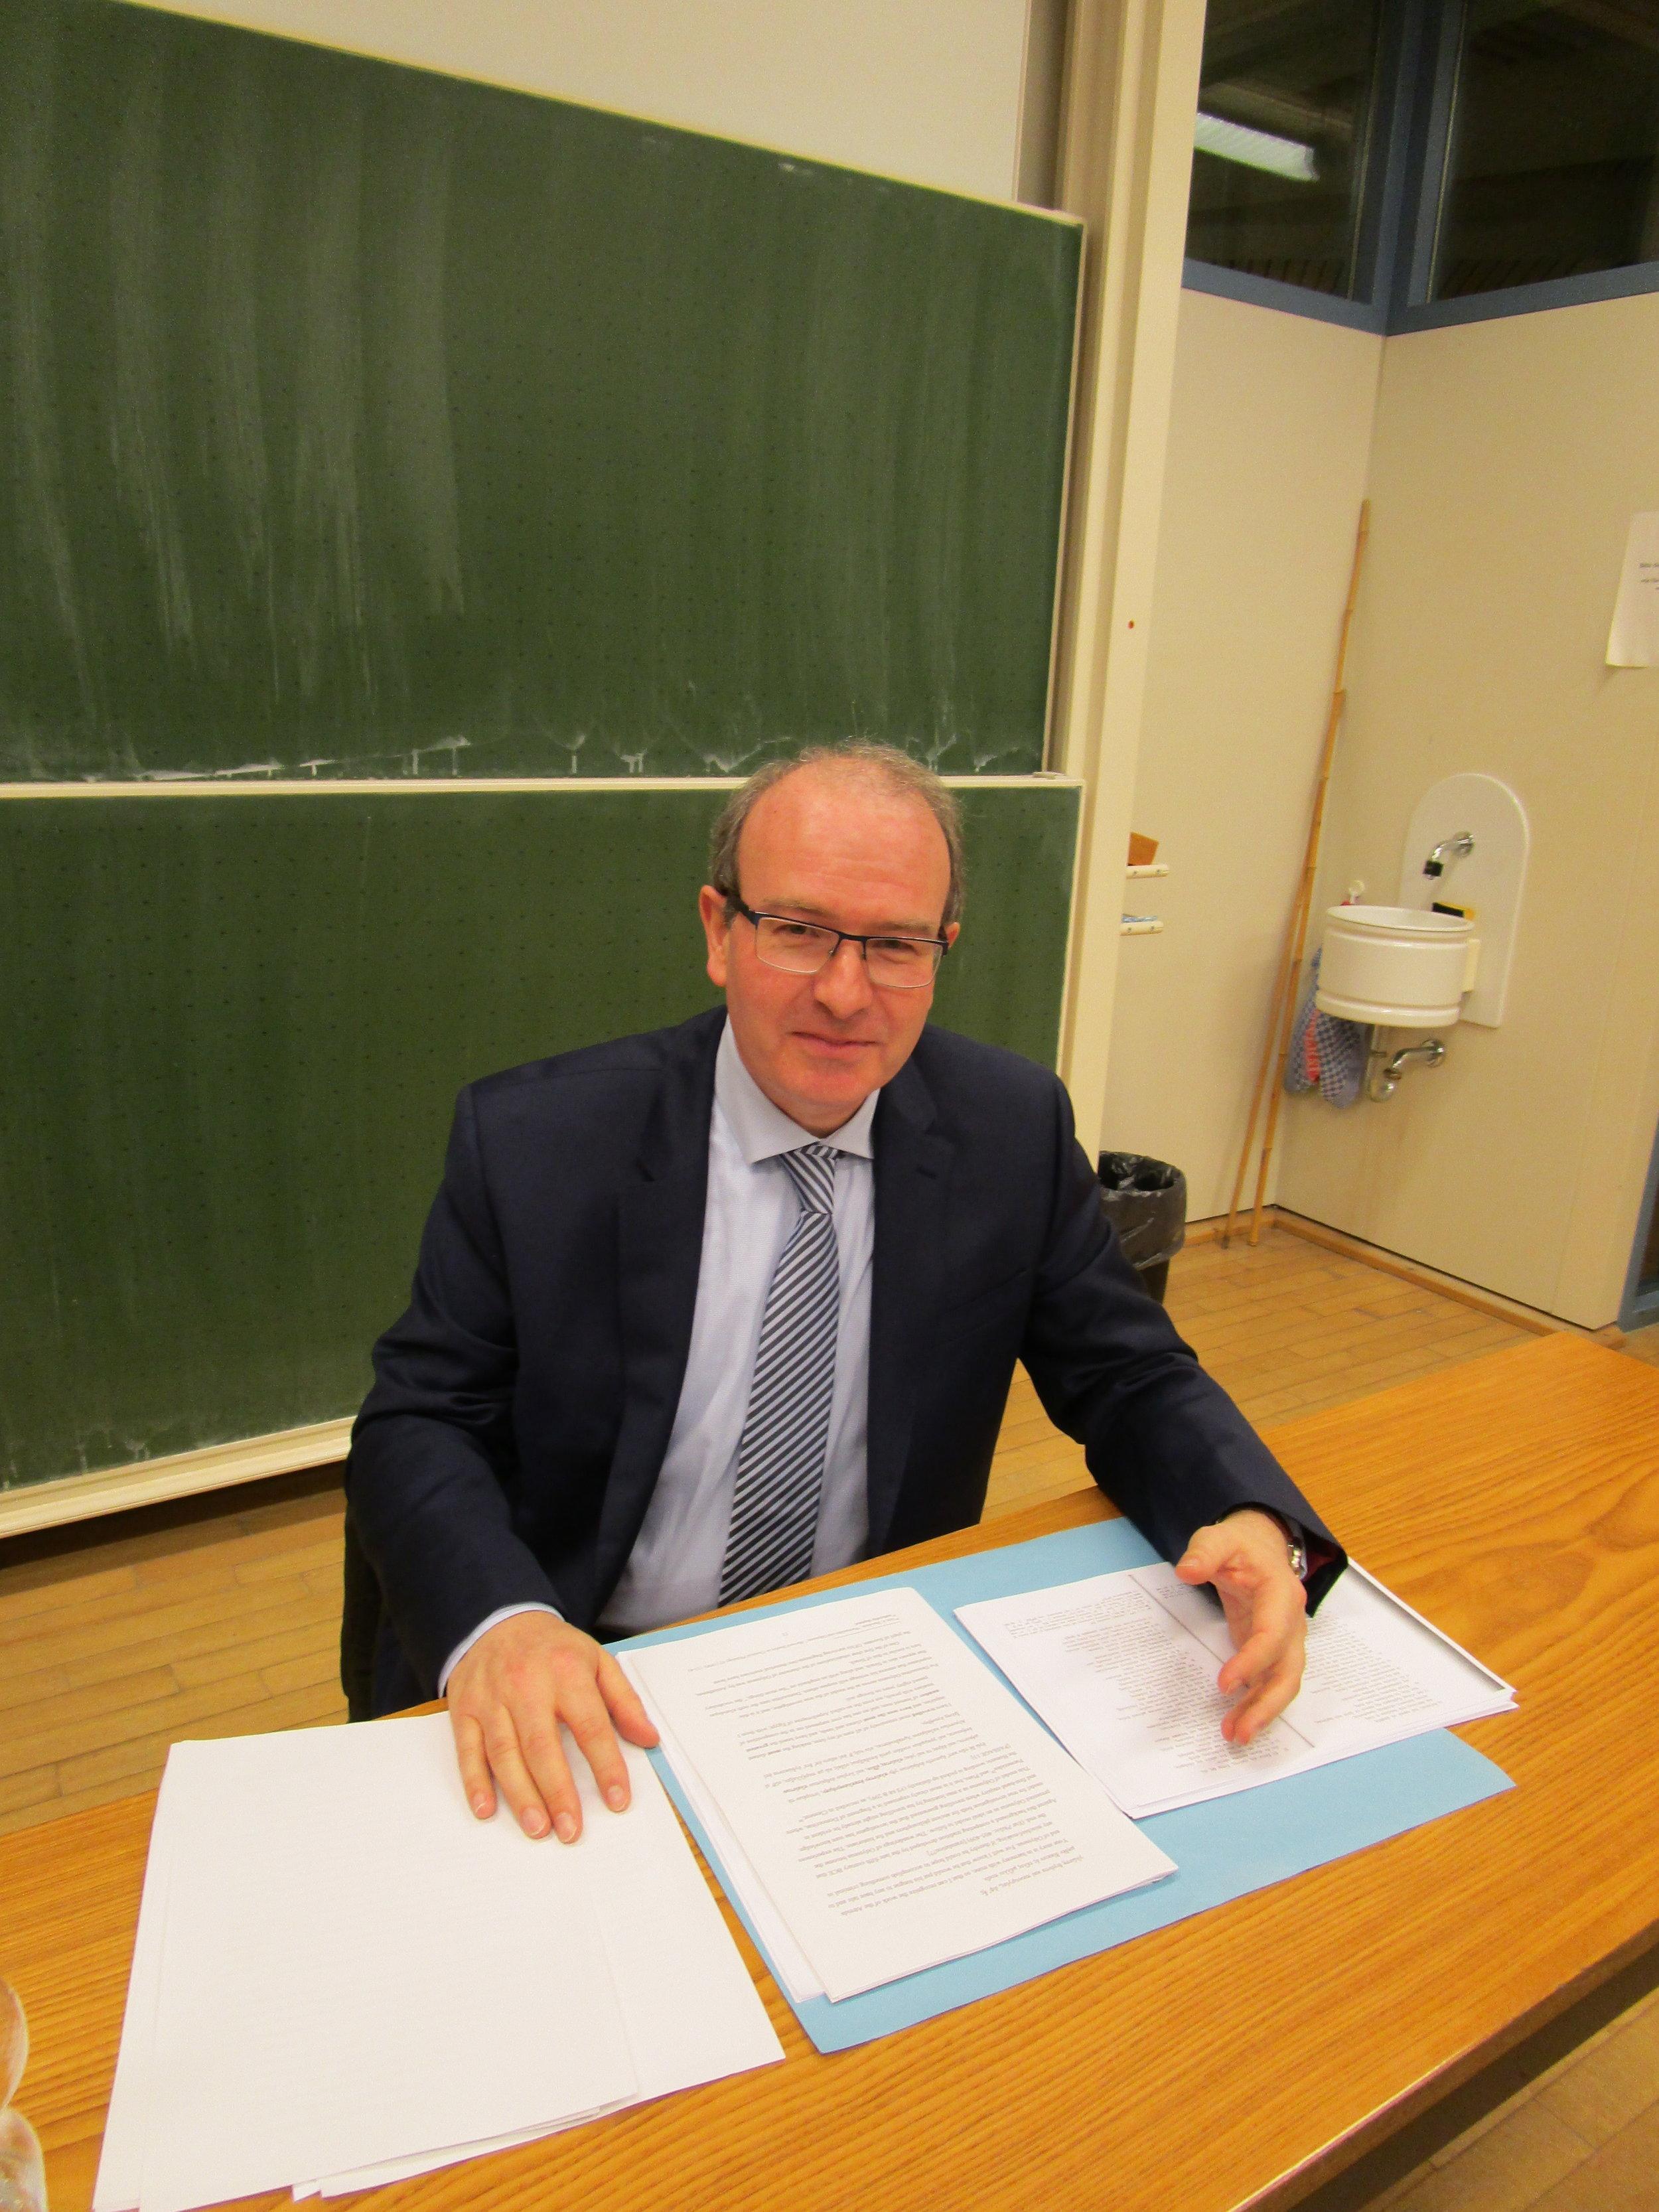 Prof. James Aitken